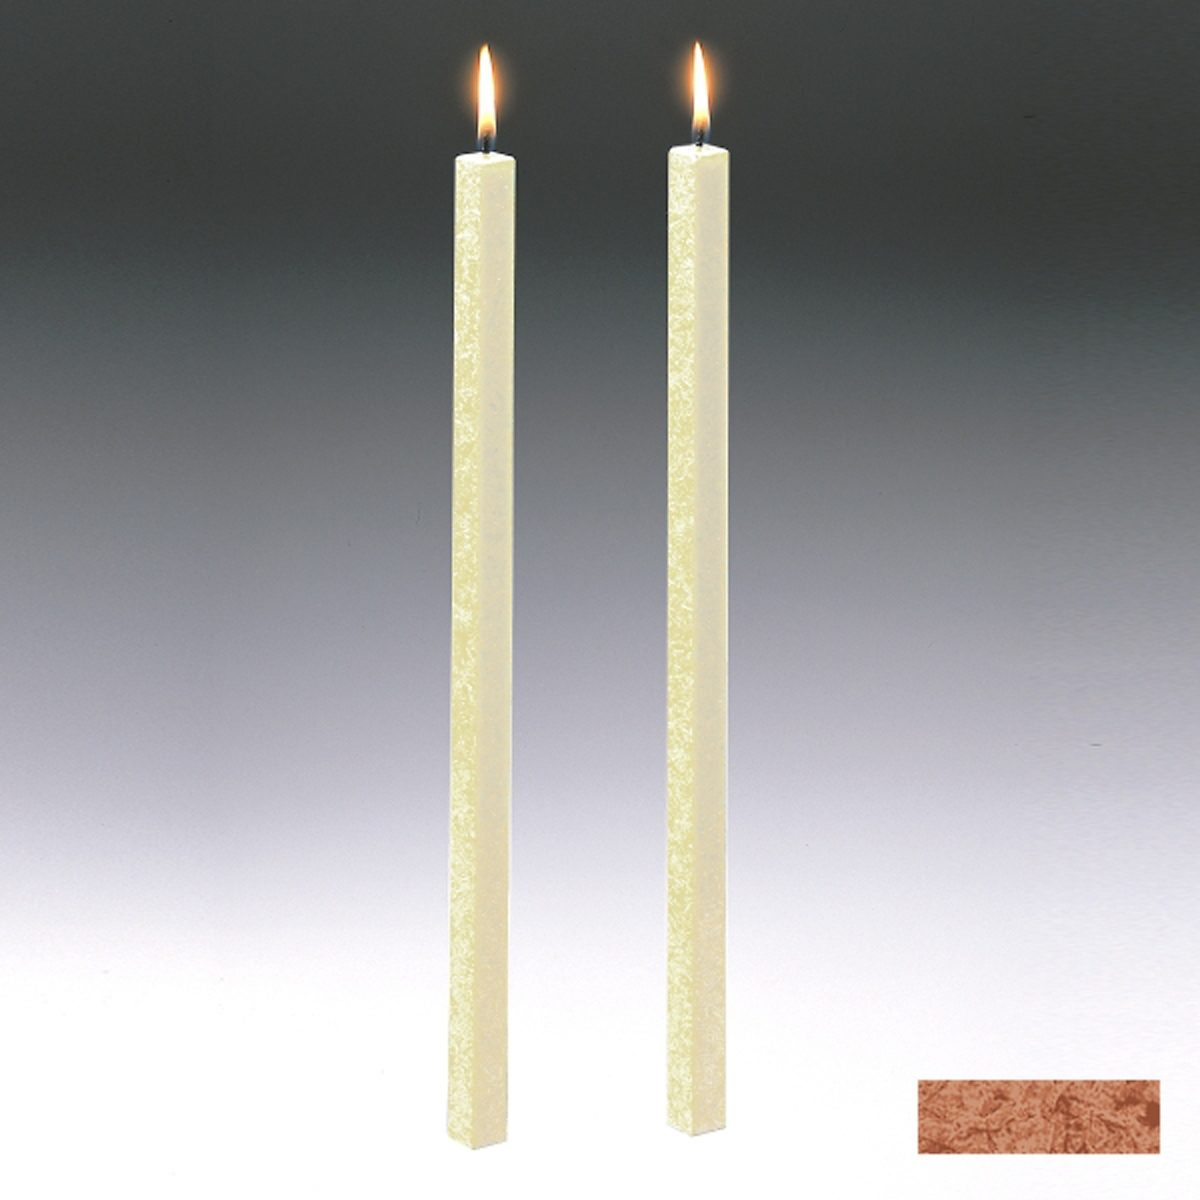 Amabiente Amabiente Kerze CLASSIC Kastanie 40cm - 2er Set